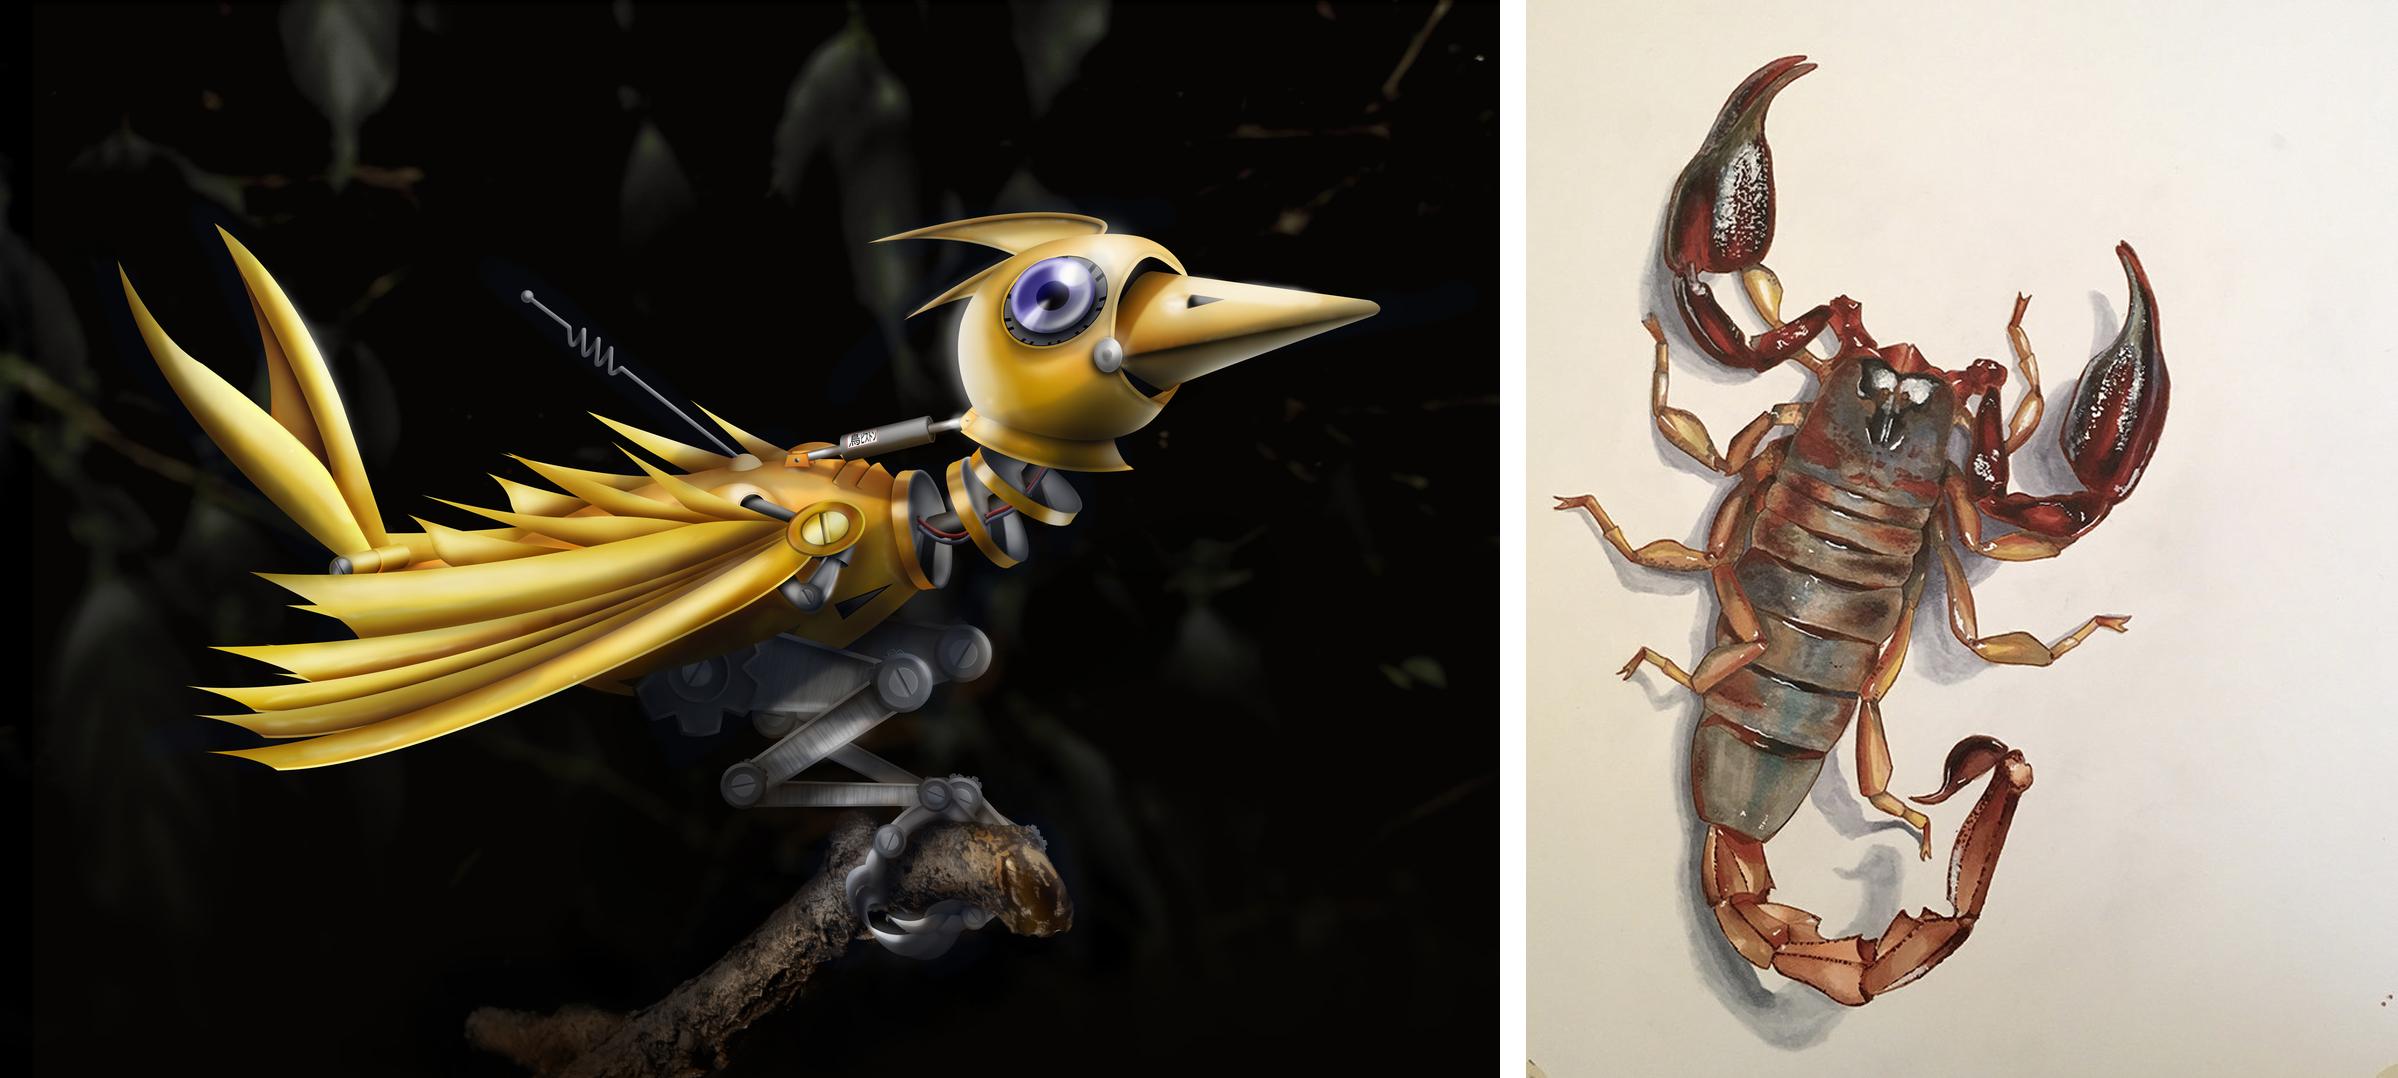 Clockwork Bird | Scorpion Illustration